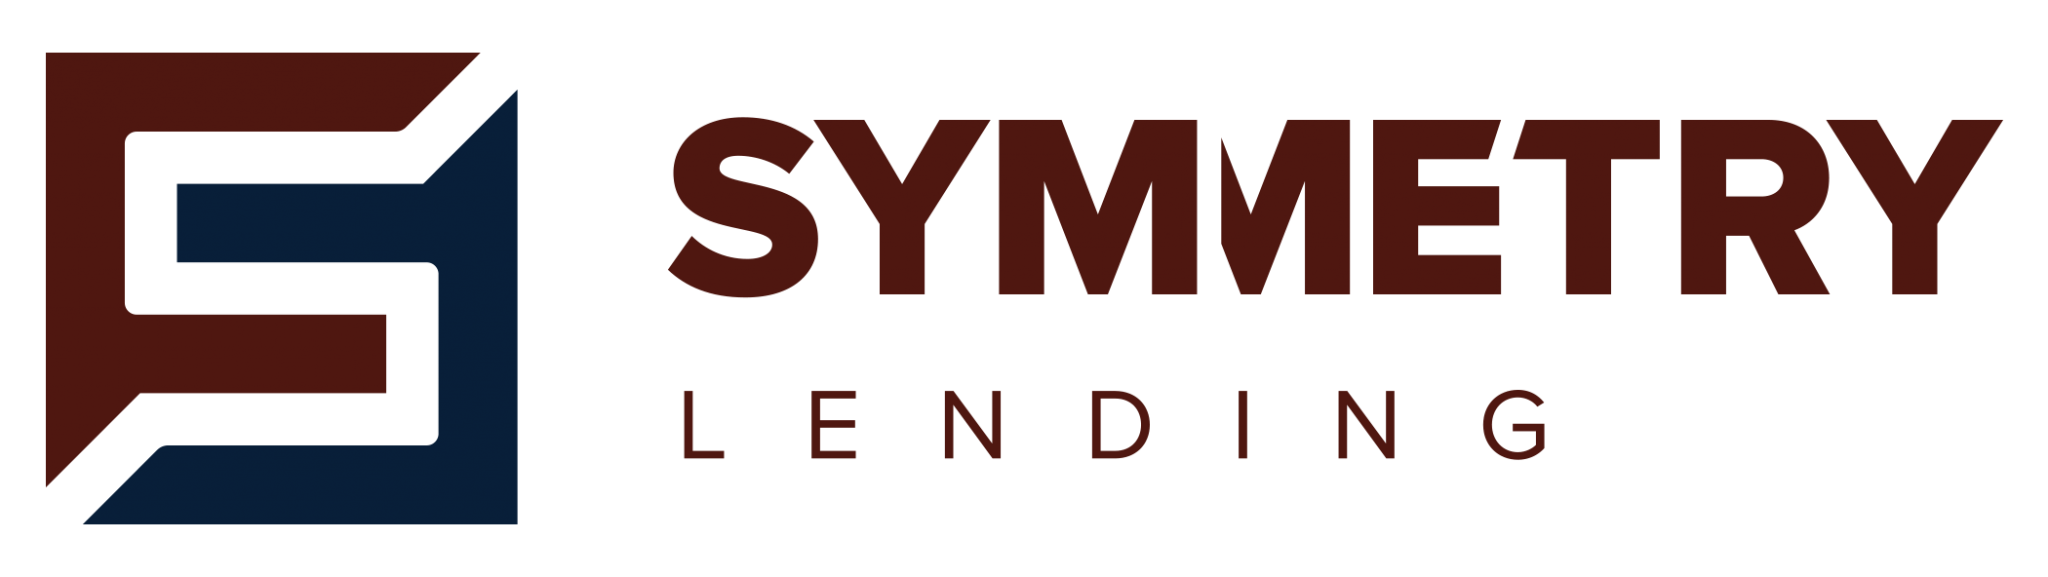 Symmetry Mortgage Lending